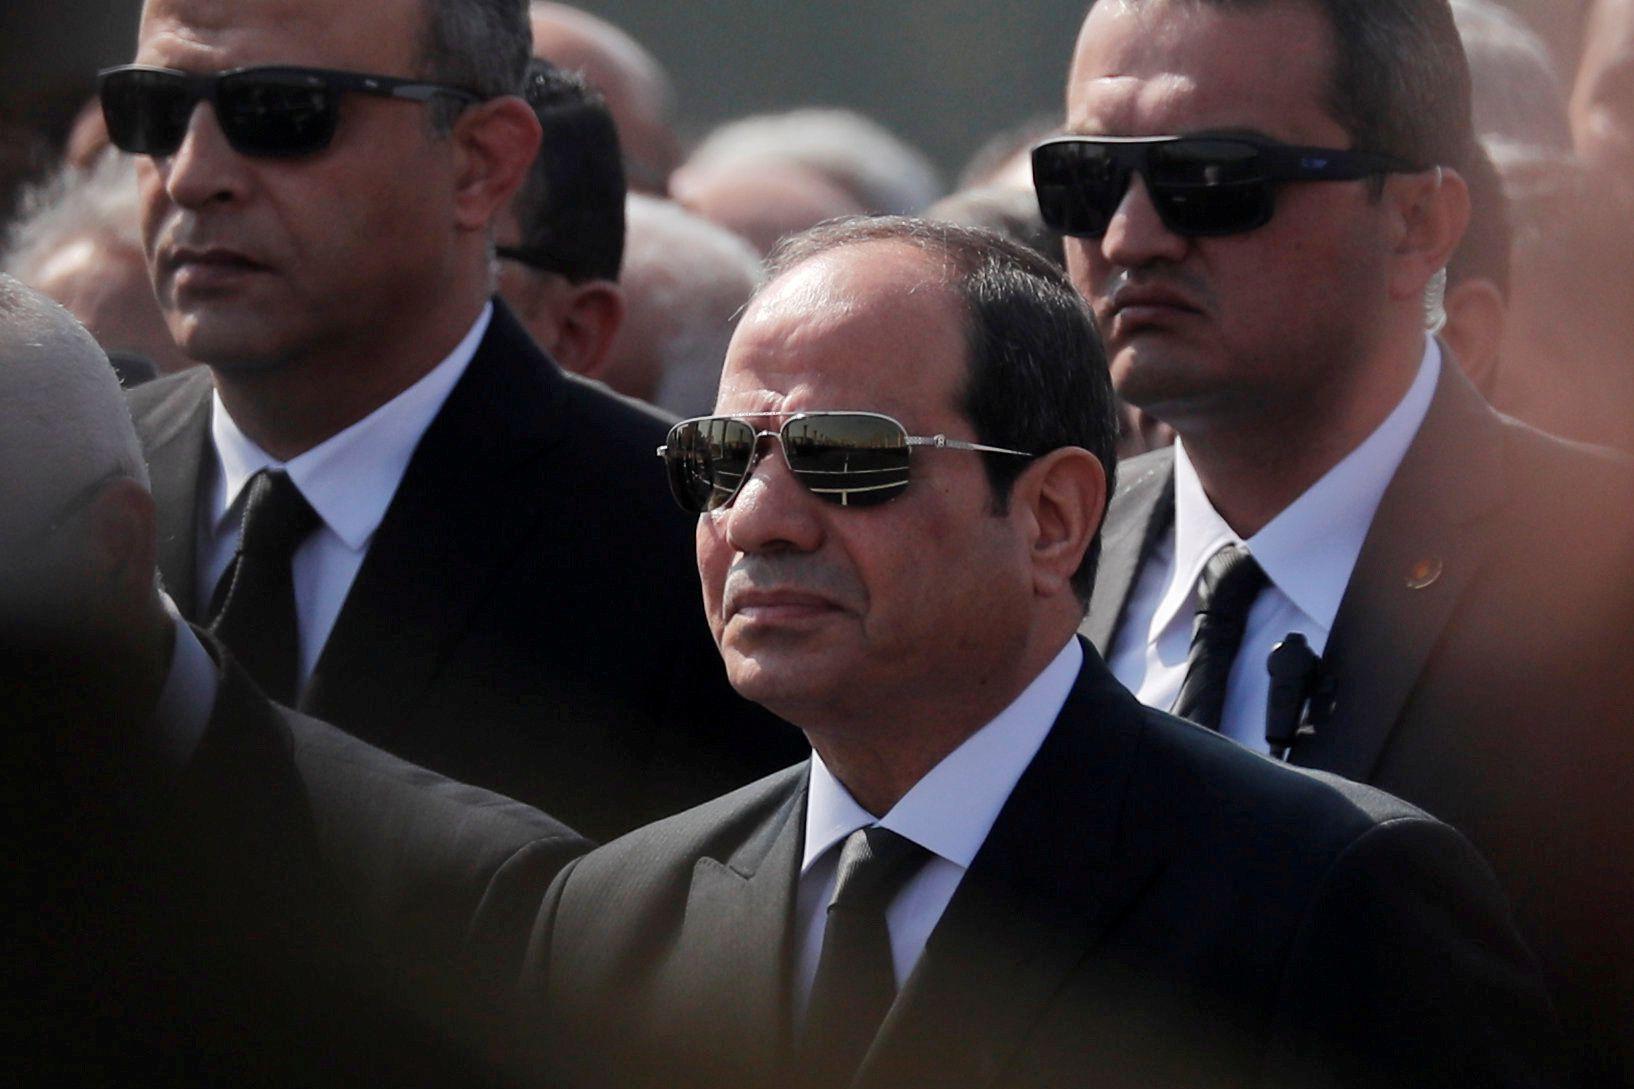 El presidente egipcio Abdel Fattah al-Sisi en el funeral del ex presidente Hosni Mubarak el 26 de febrero de 2020 (REUTERS/Amr Abdallah Dalsh/File Photo)